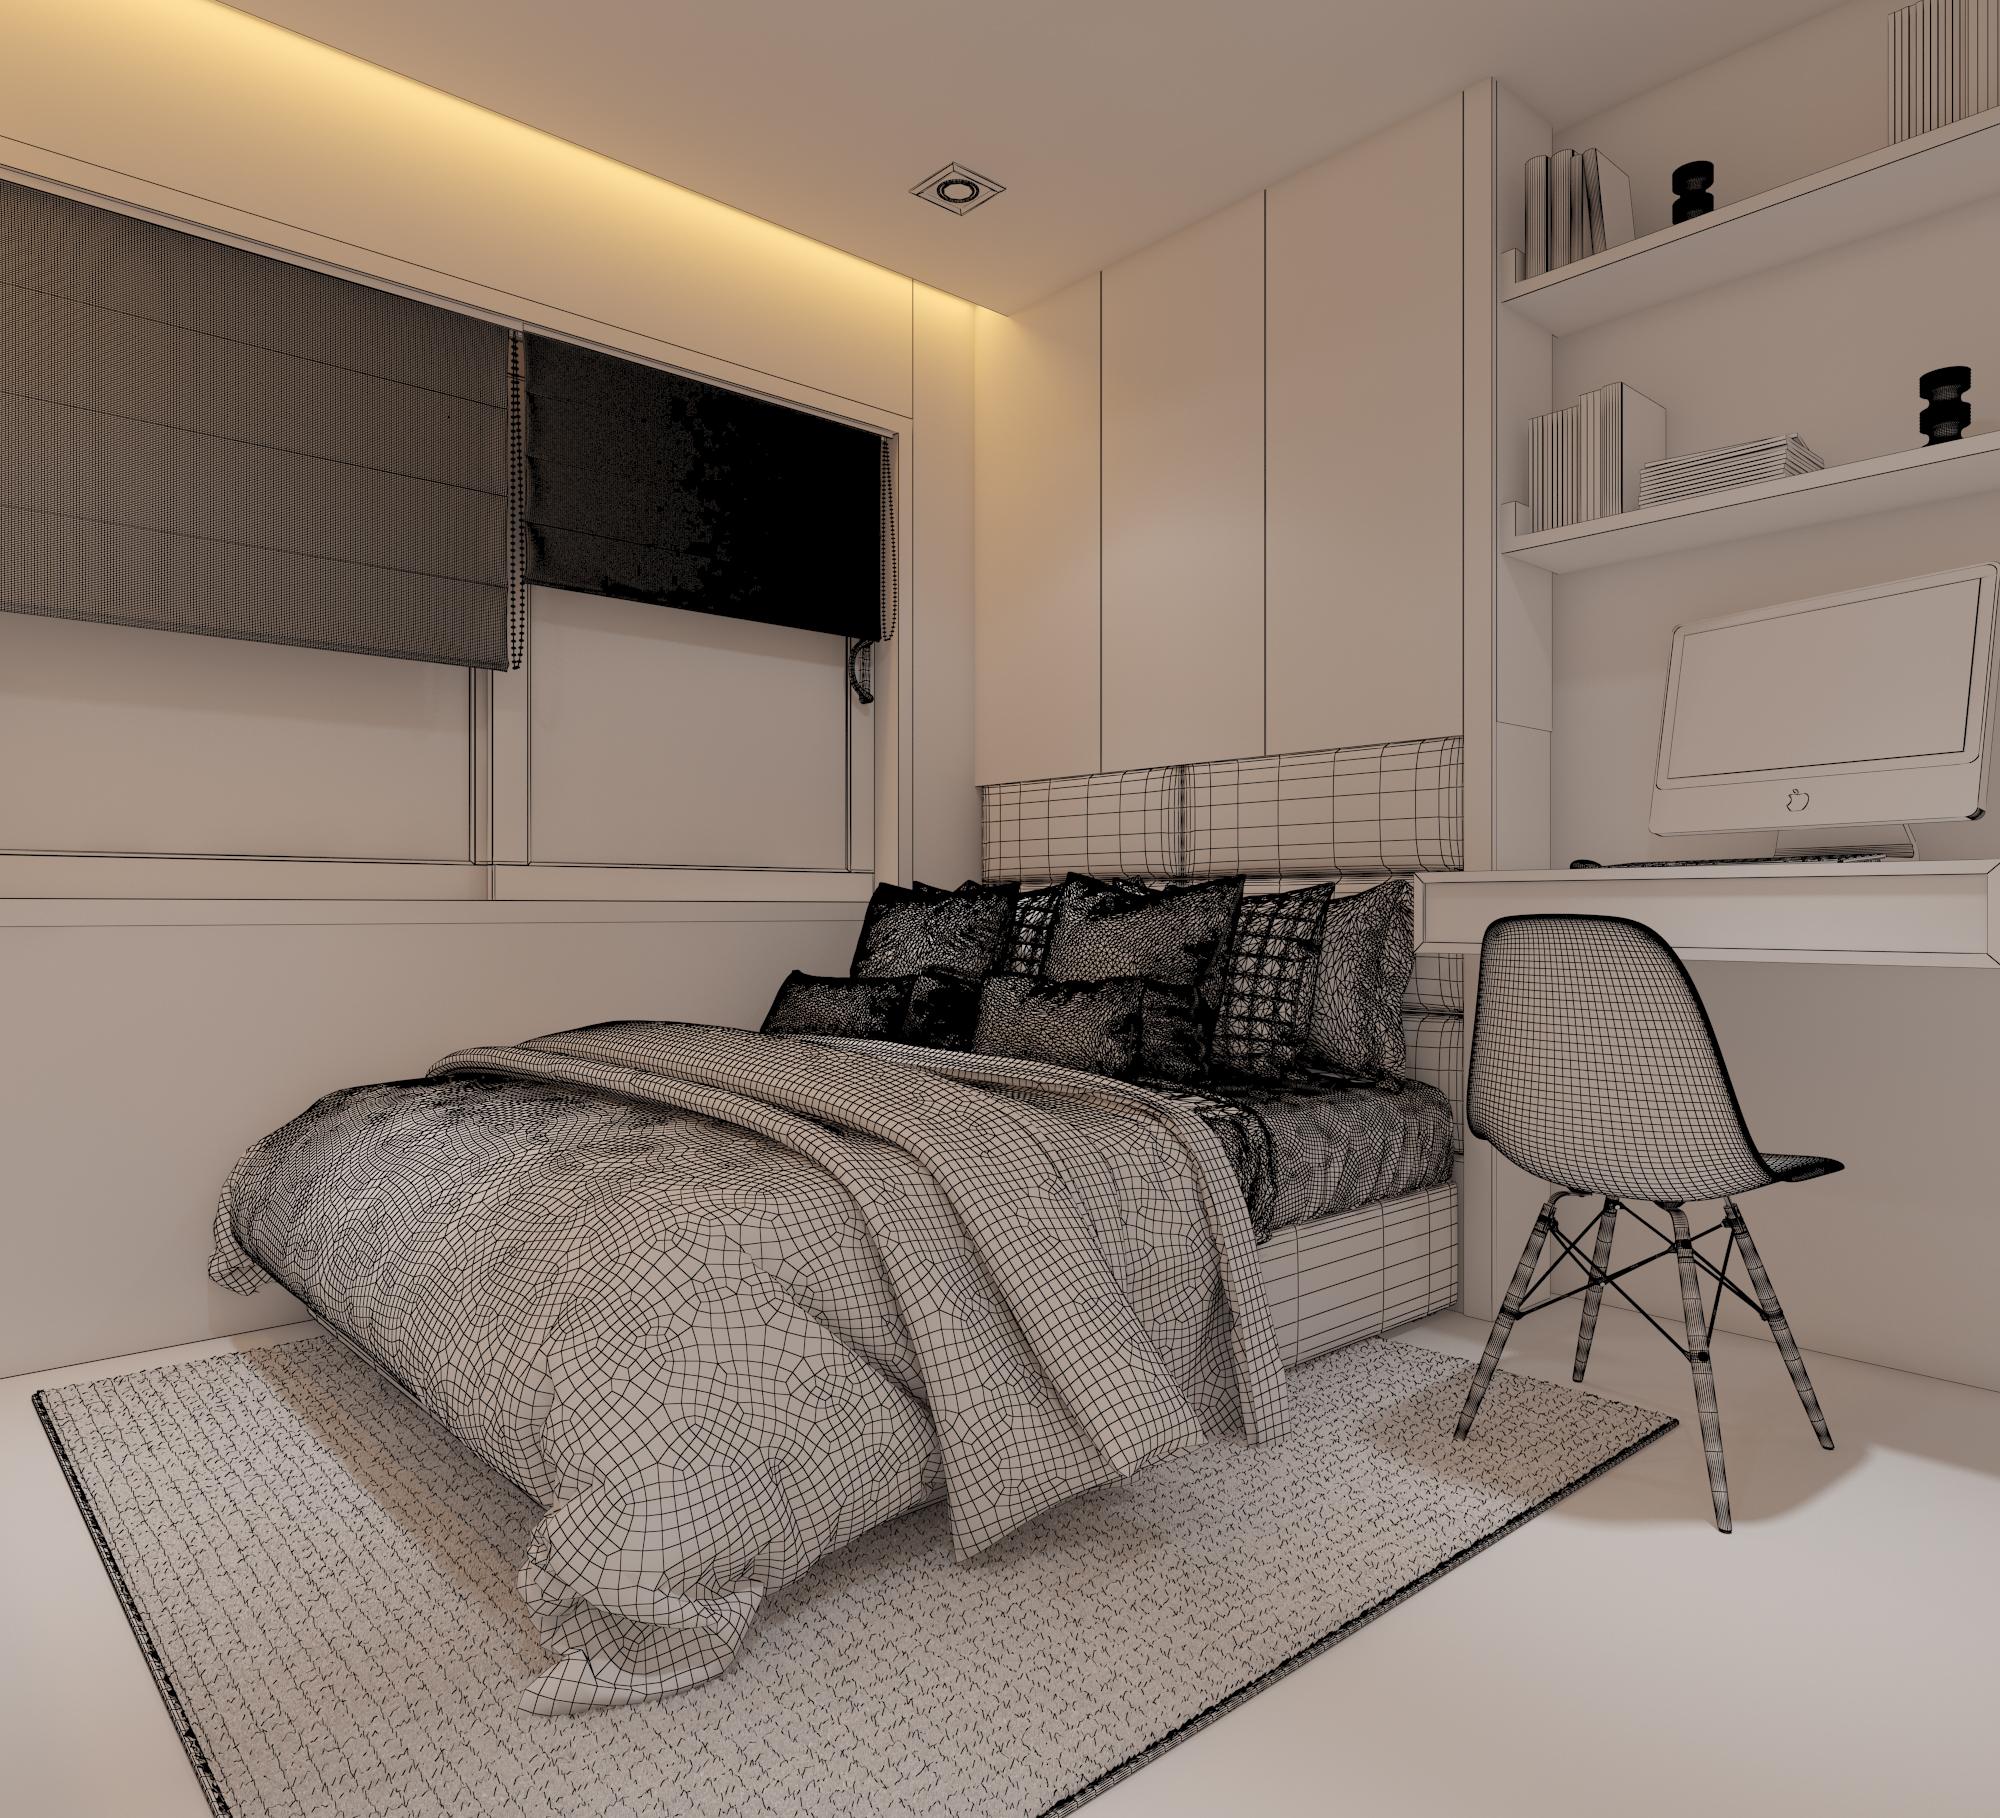 Cutaway apartment full furnitures modern design 3d model max 279973